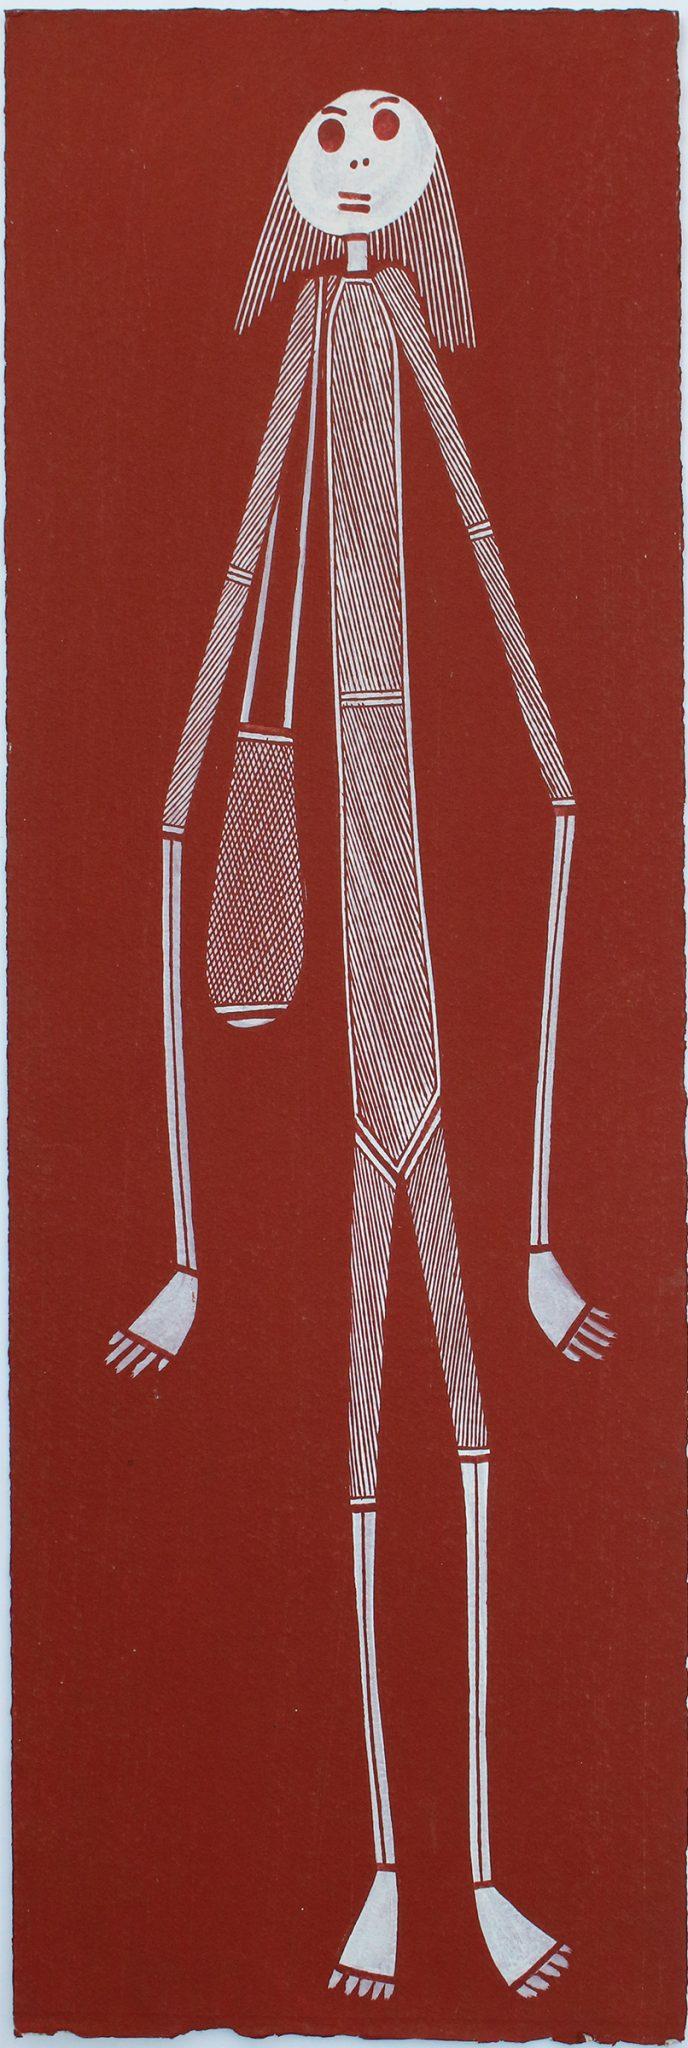 Mimih Spirit by Isaiah Nagurrgurrba